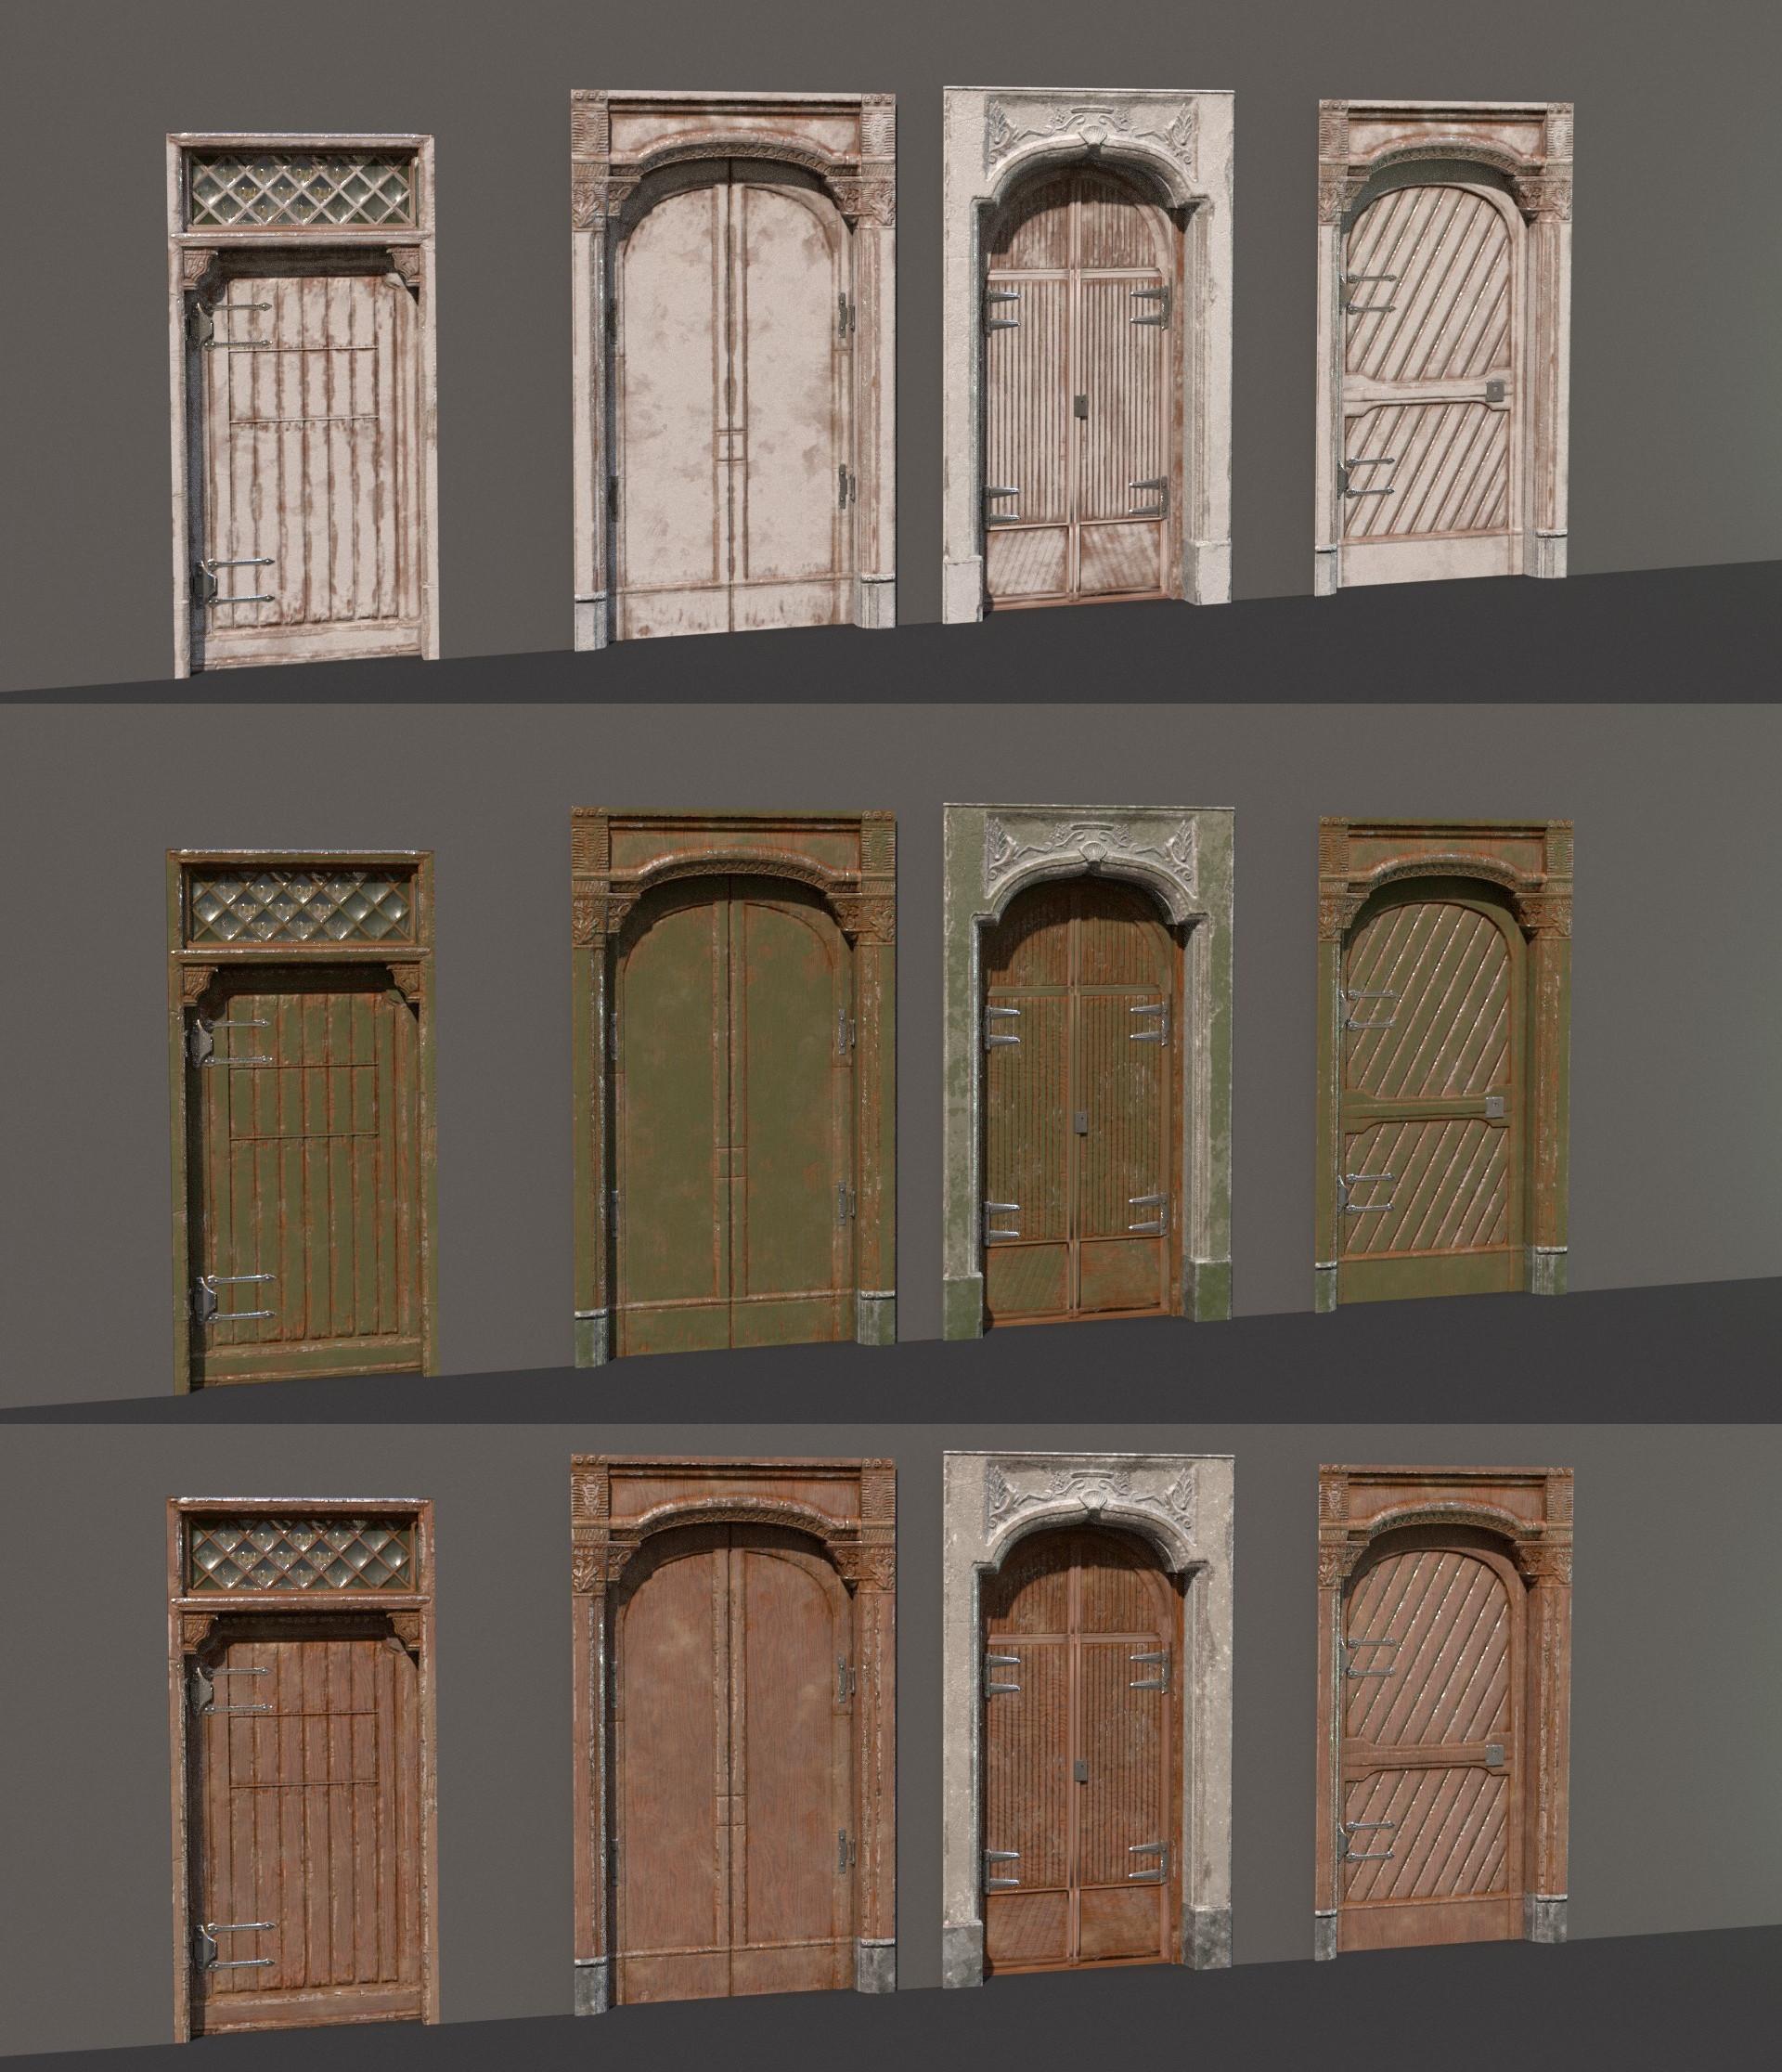 Nicolo zubbini doors2